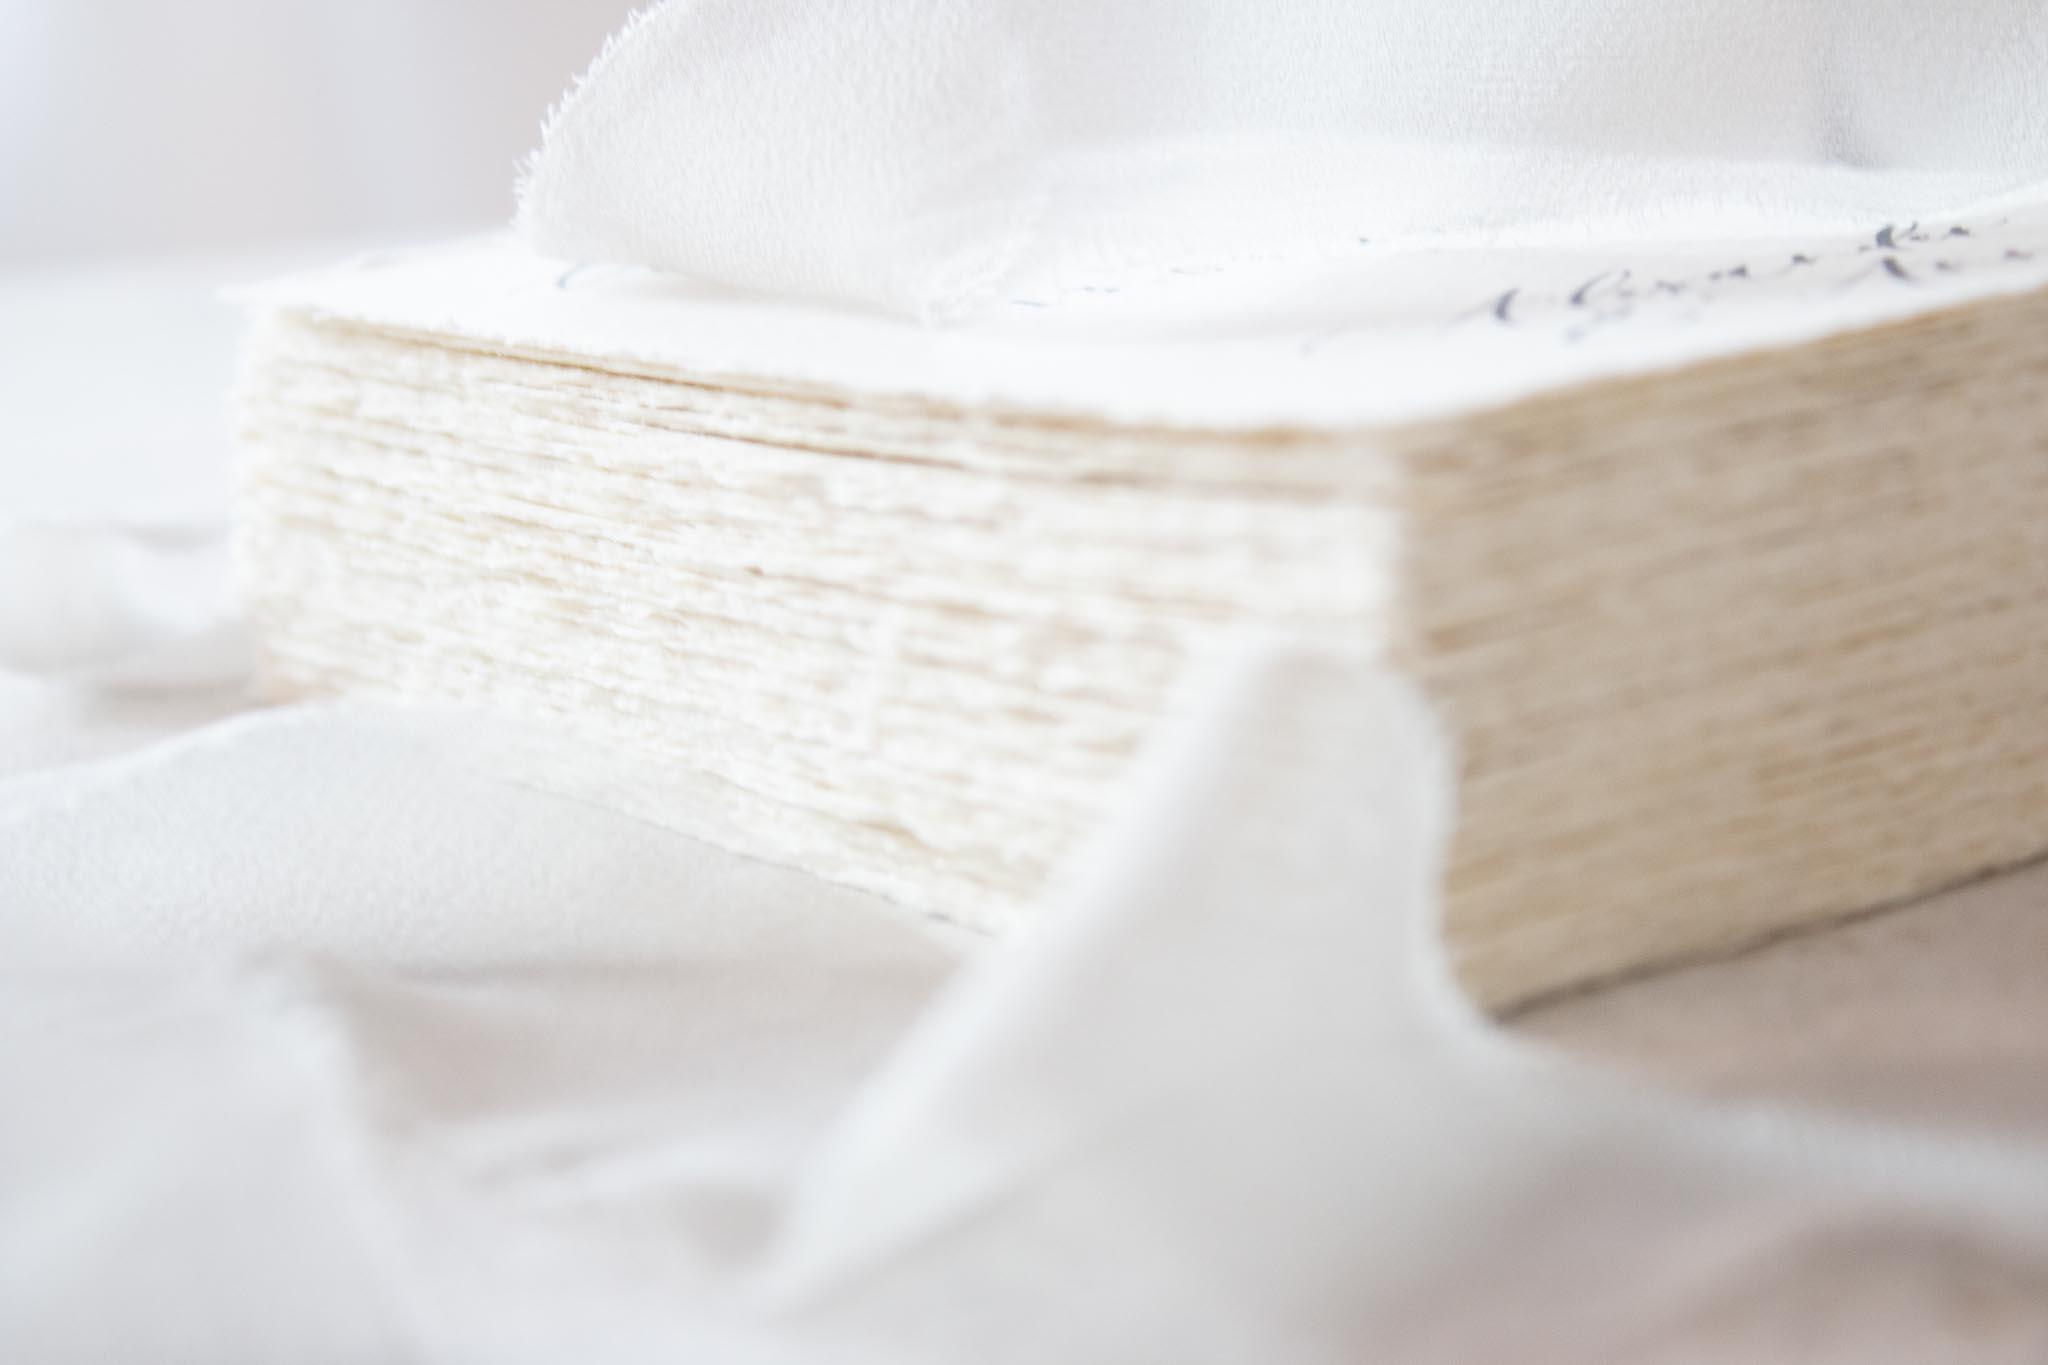 individuelle-Papeterie-handmade-paper-büttenpapier